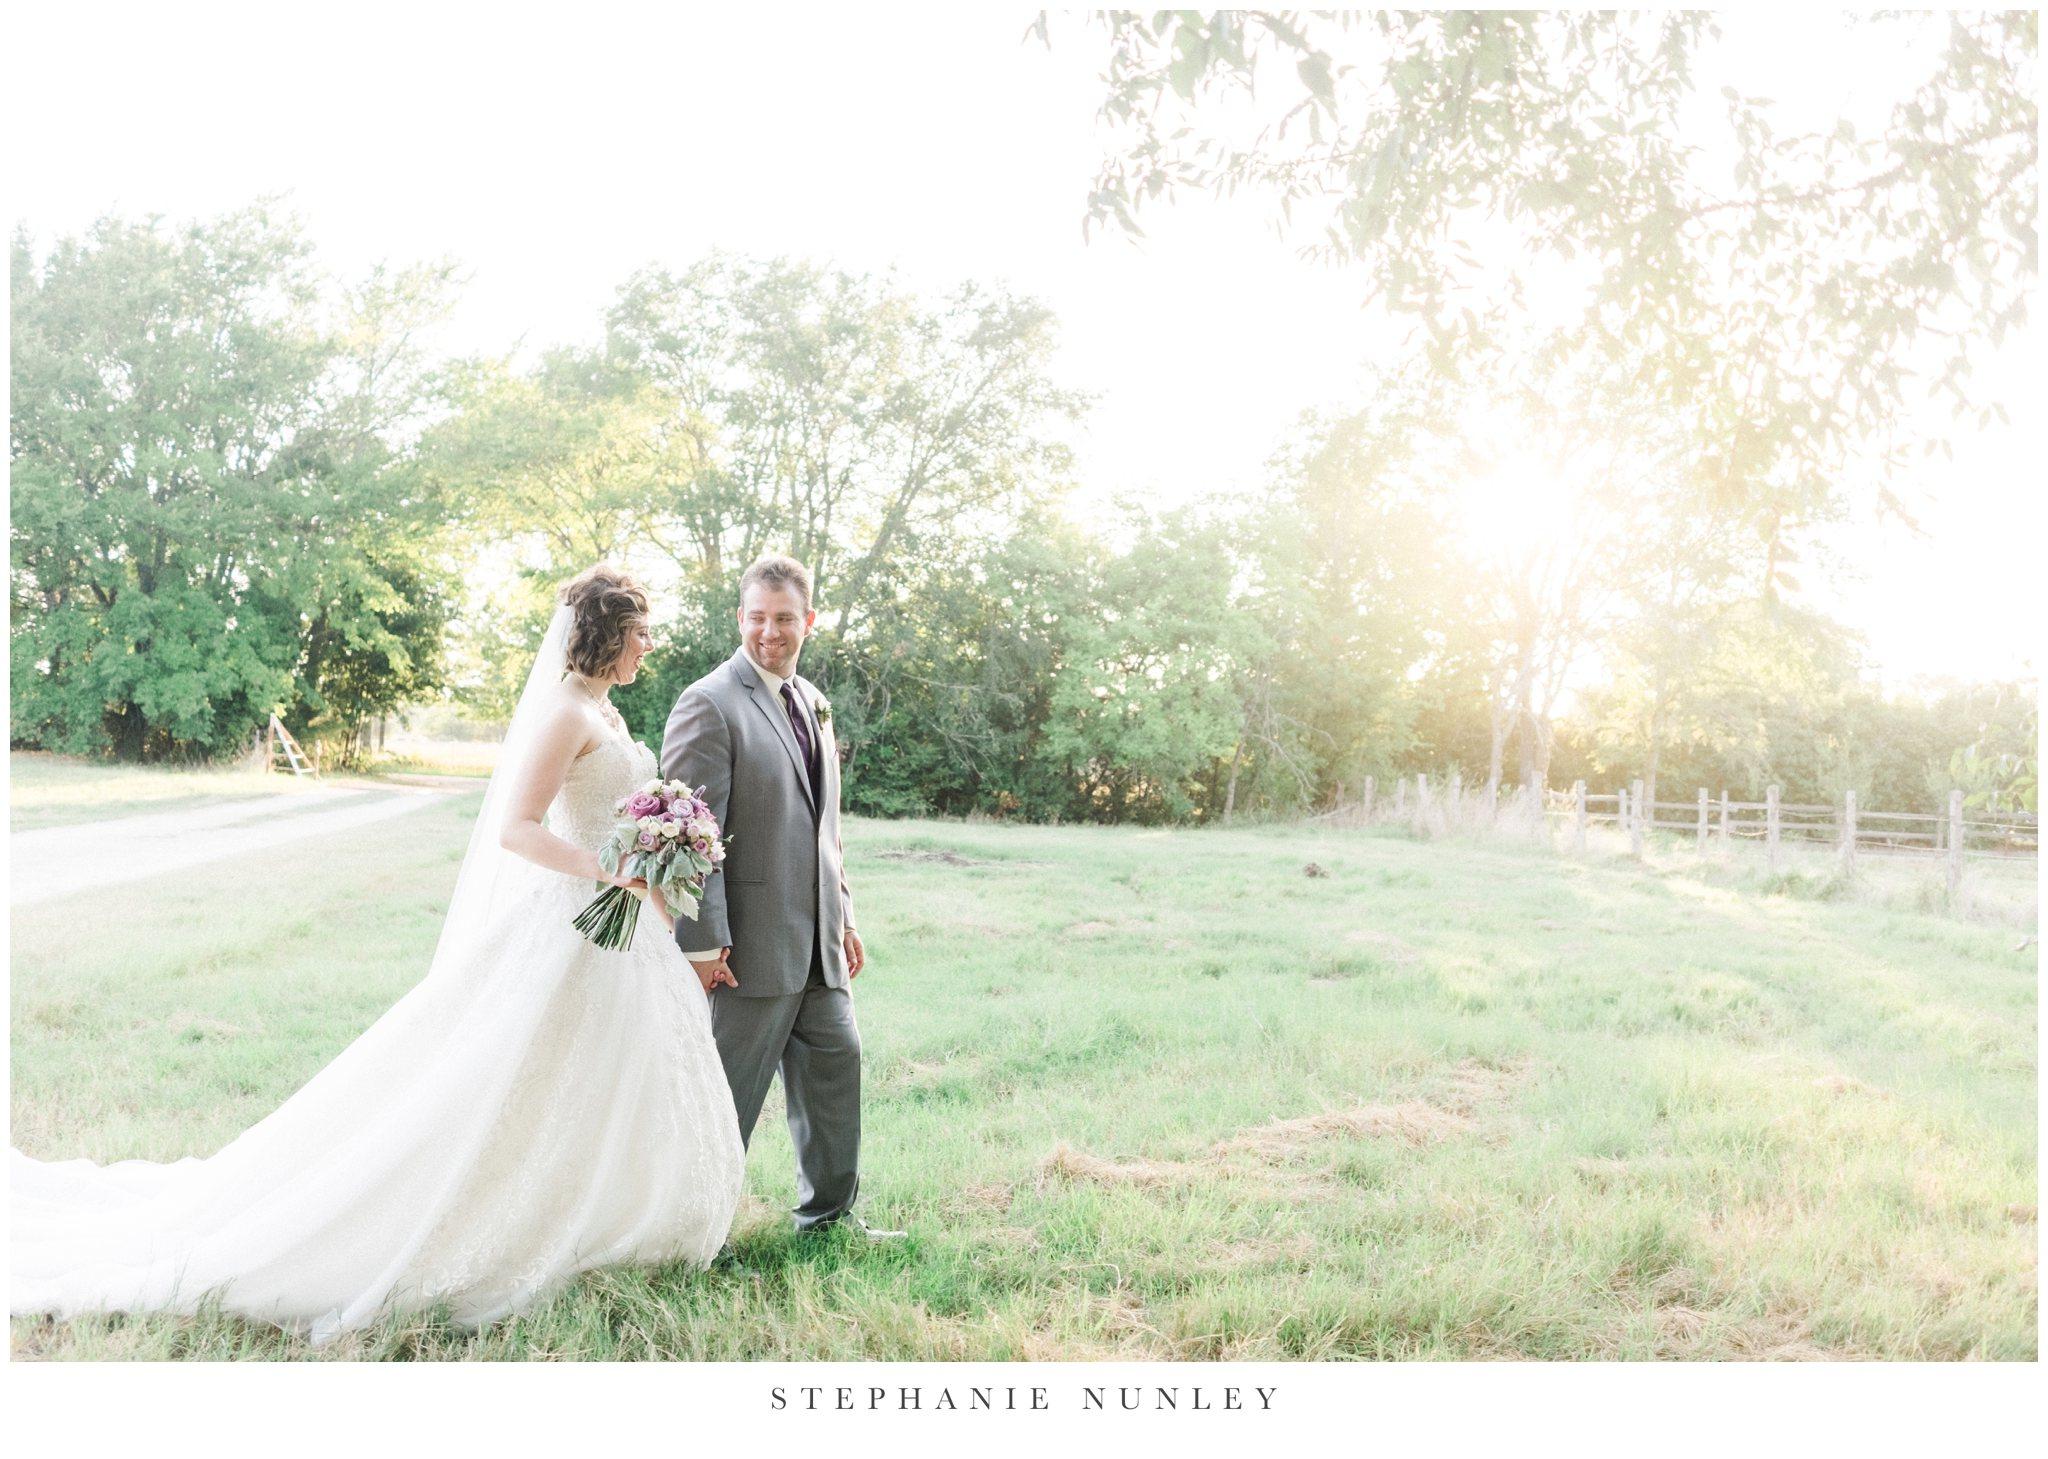 southern-classy-outdoor-barn-wedding-photos-0089.jpg